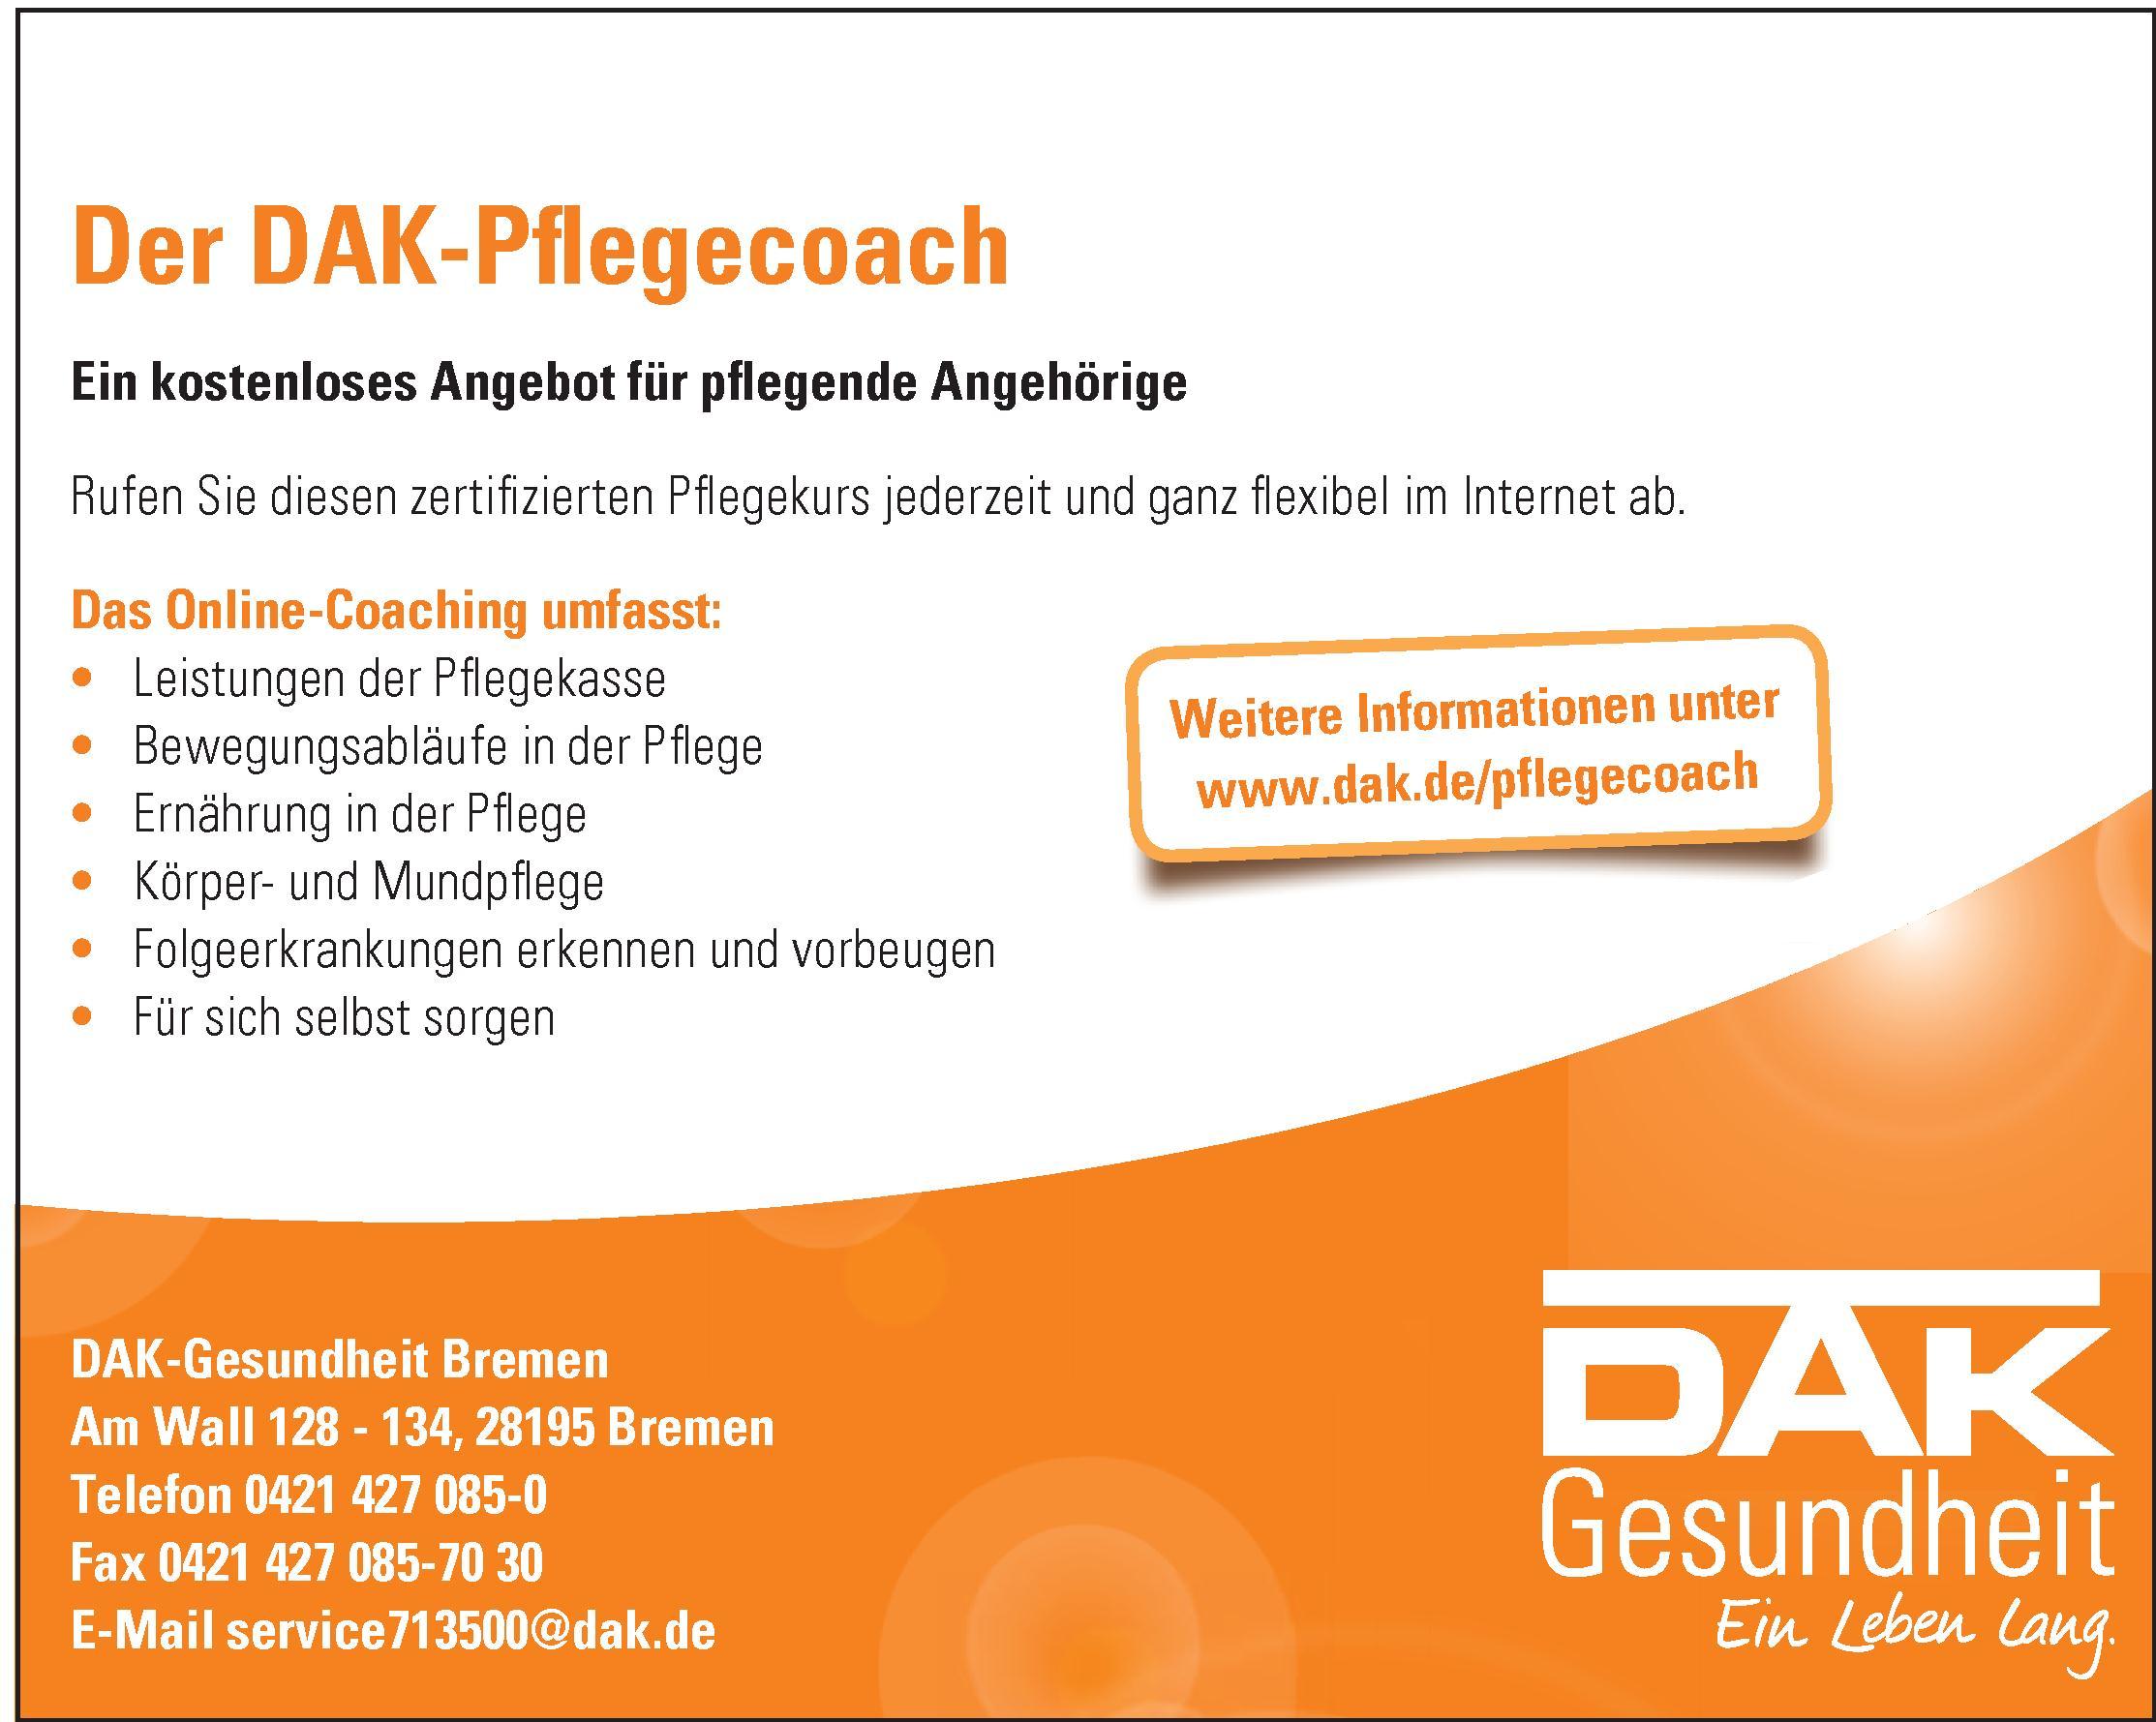 DAK-Gesundheit Bremen